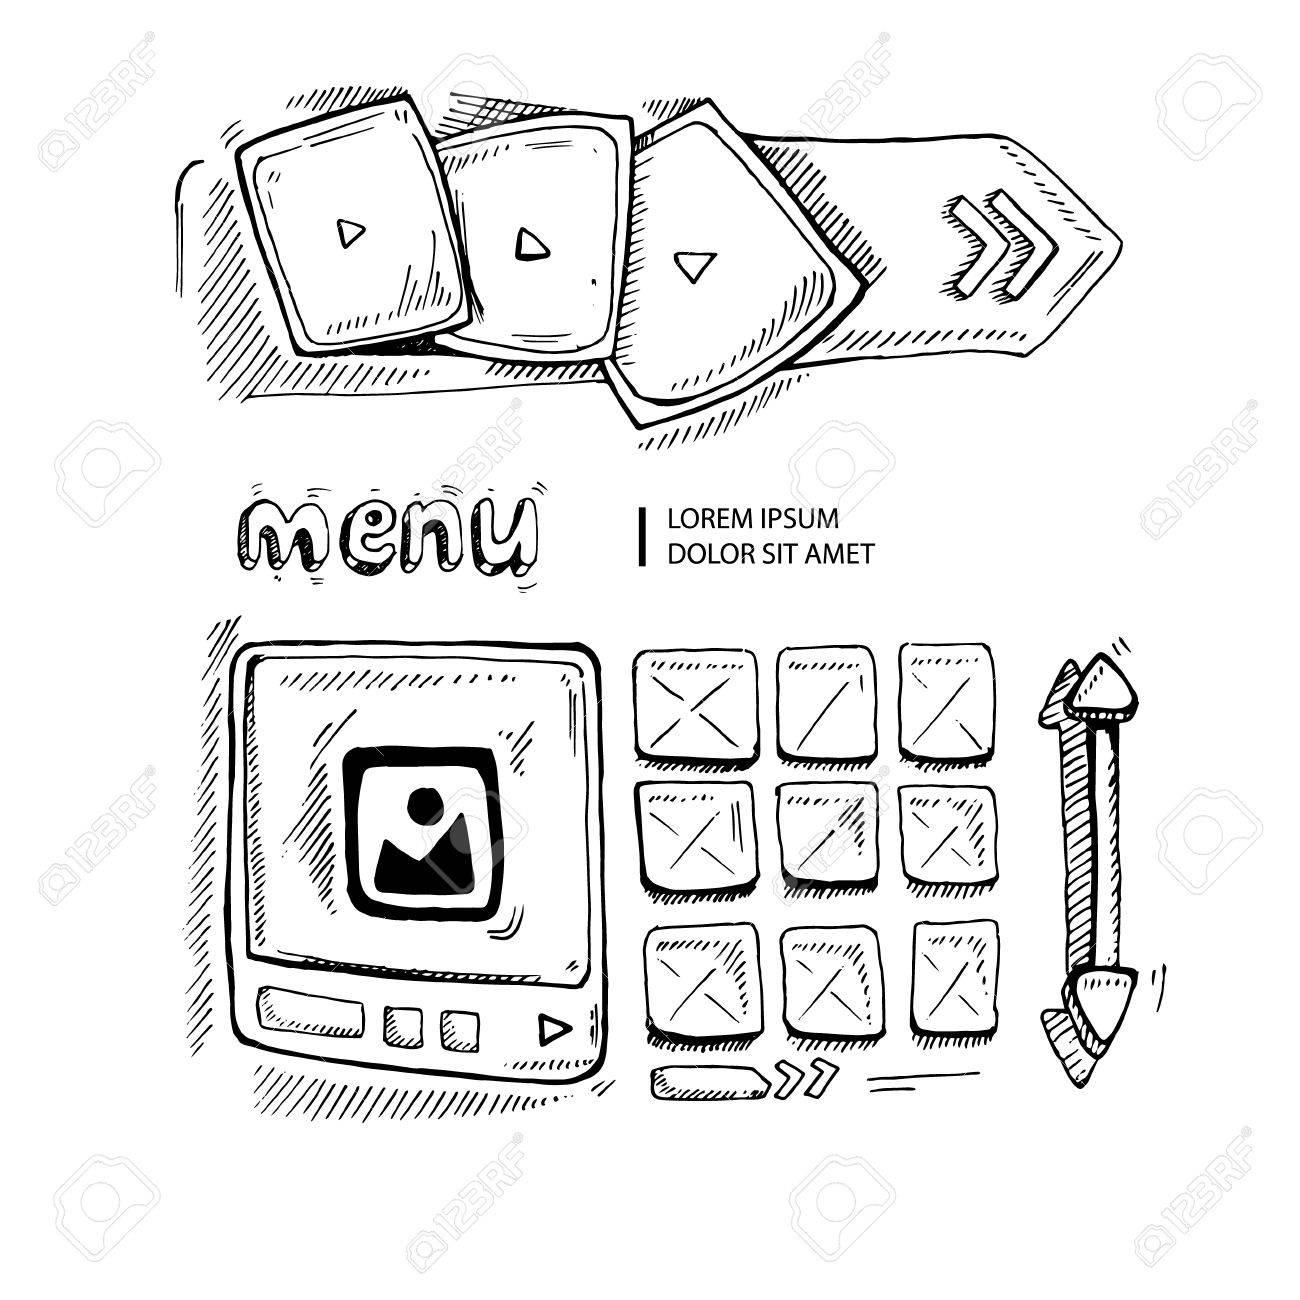 1300x1300 Wireframe Ui Kit. Web Design Portfolio Sketch Elements Isolate